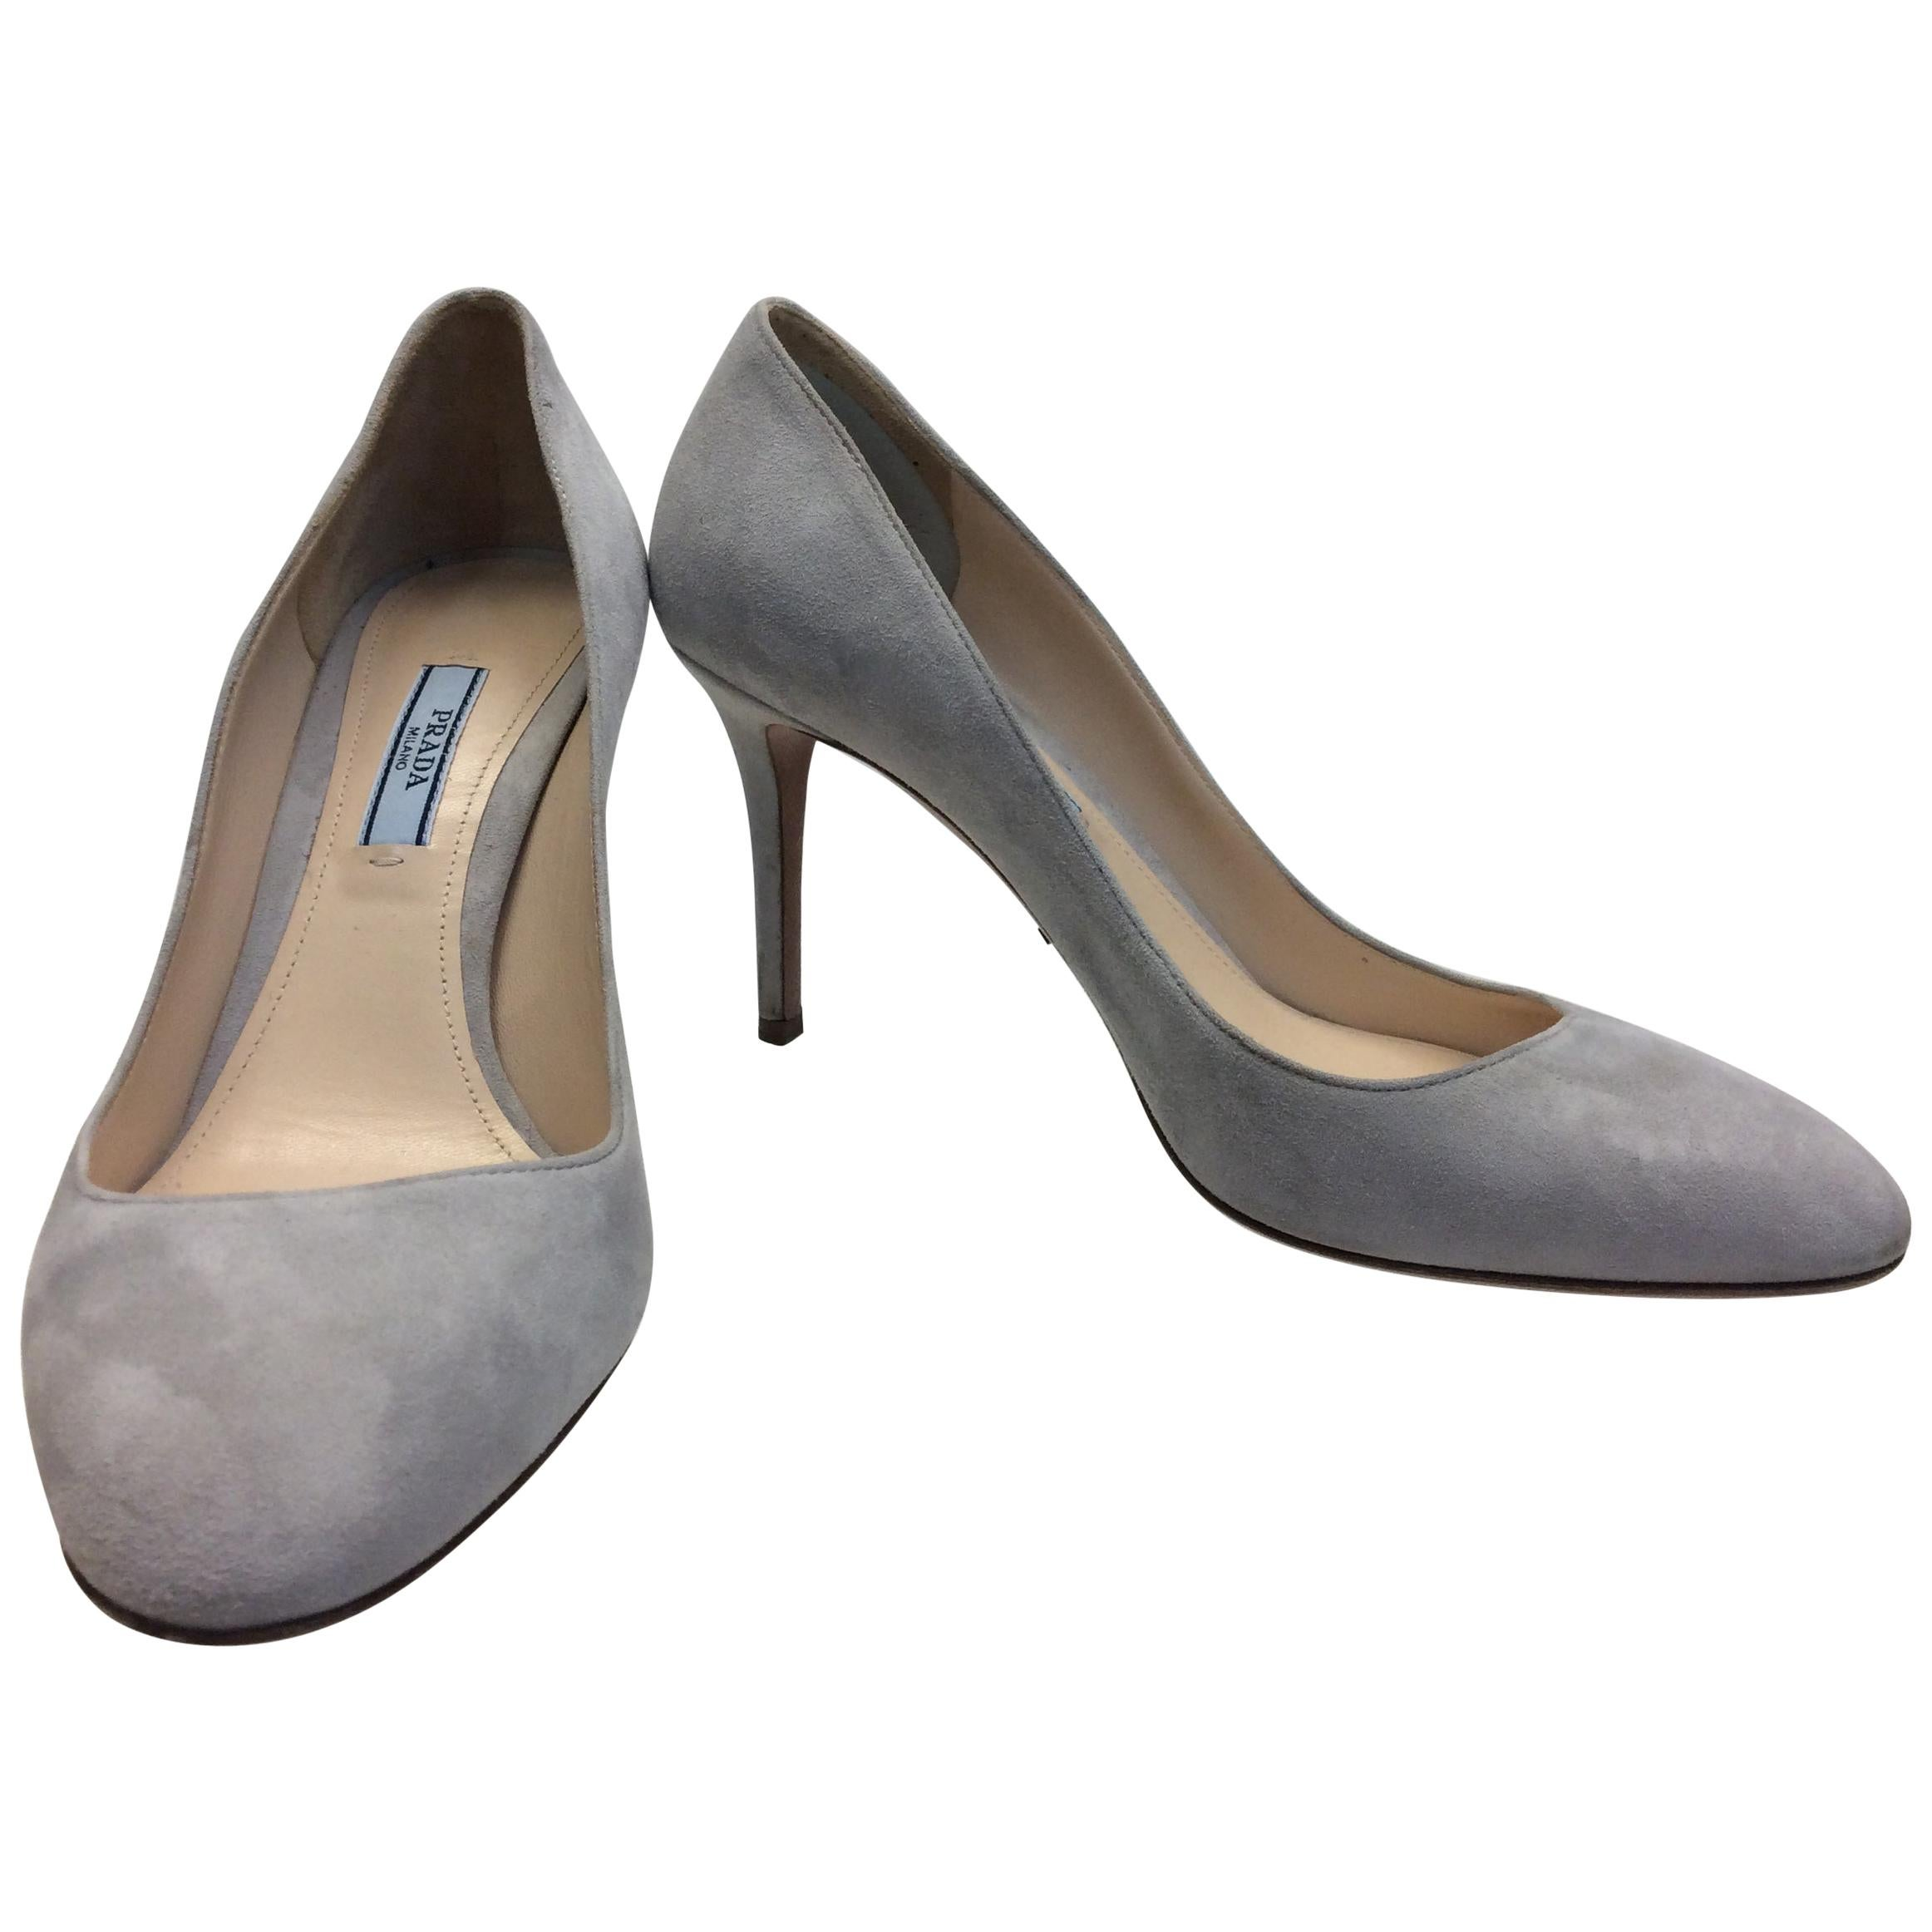 6b0c5d1937725 Prada Grey Suede Sneakers For Sale at 1stdibs